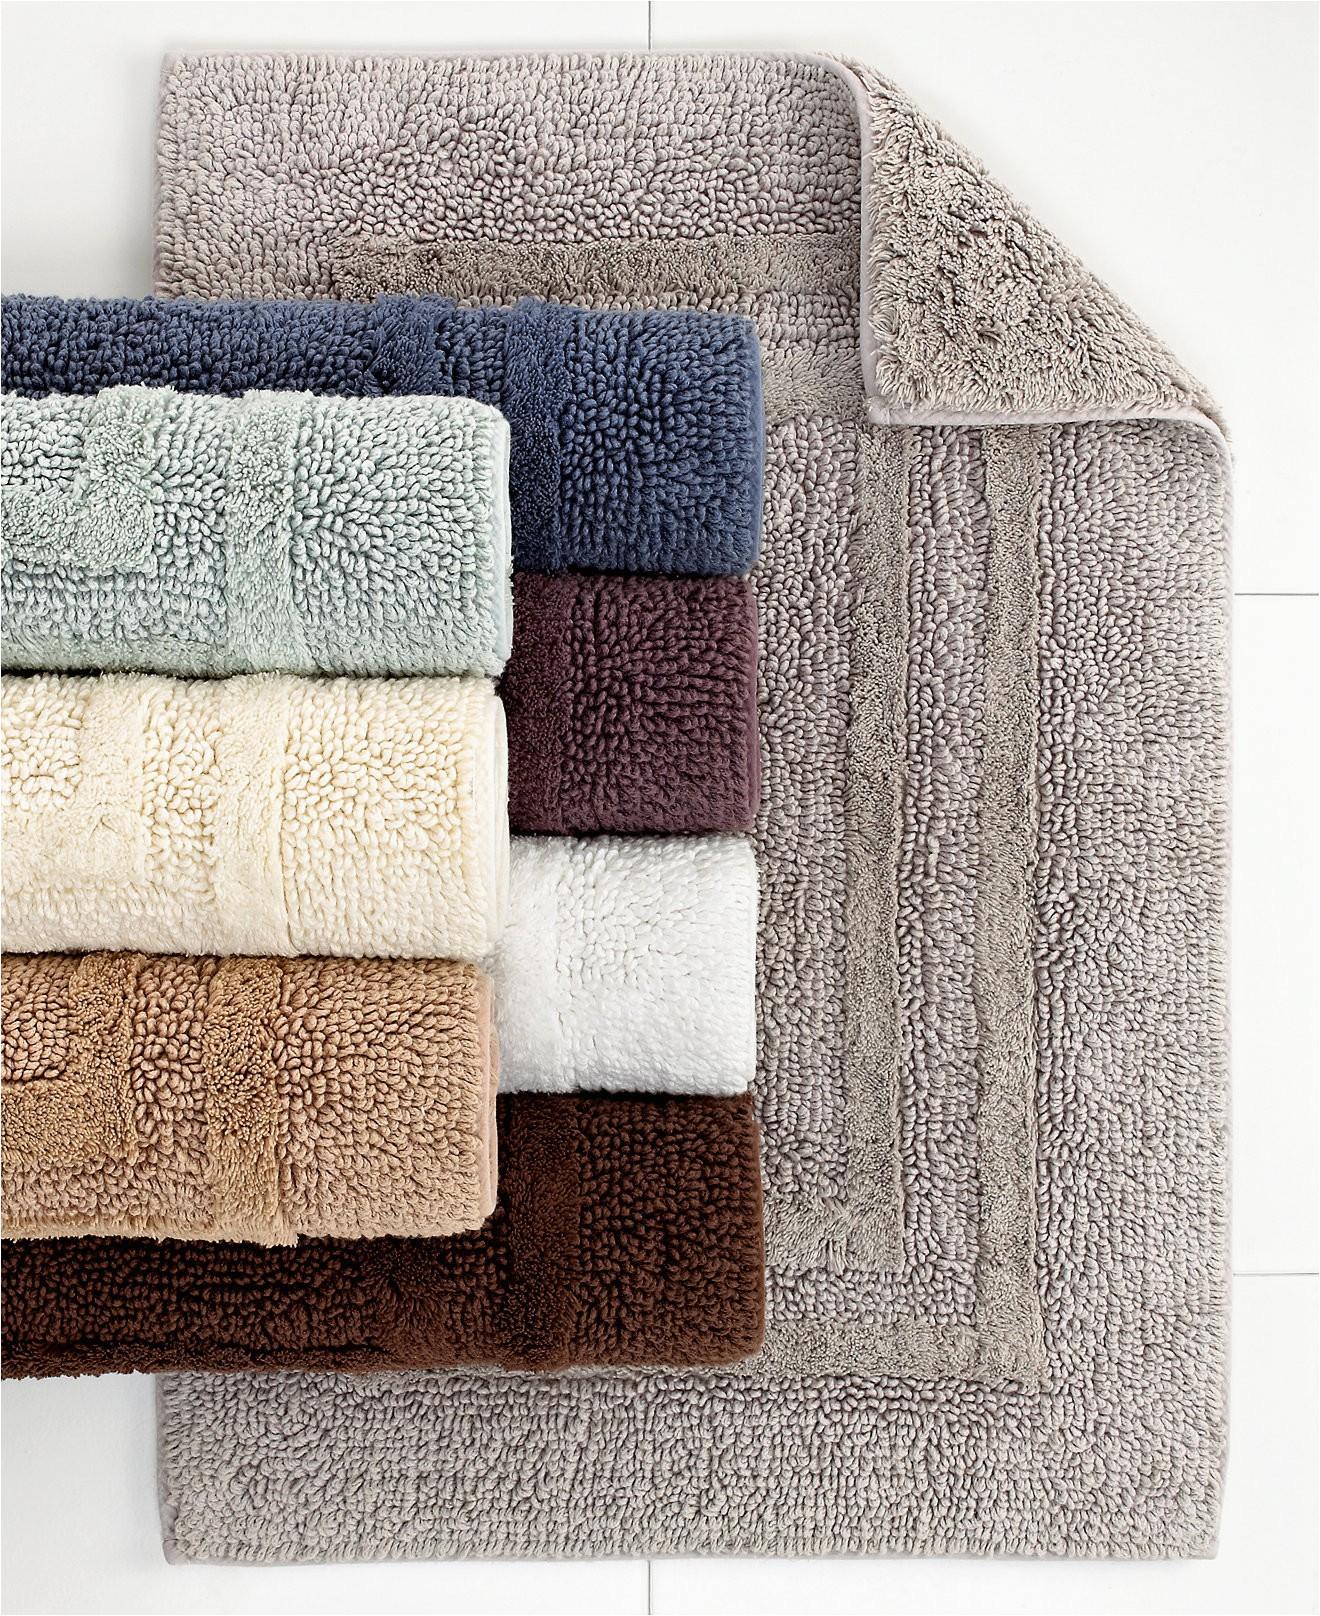 small bathroom rugs and mats bathroom runners mats bath mat anthropologie bath mat bath tub mat memory foam bath mat set ikea bath mat living moss bath mat foam bath mat small bathroom rug